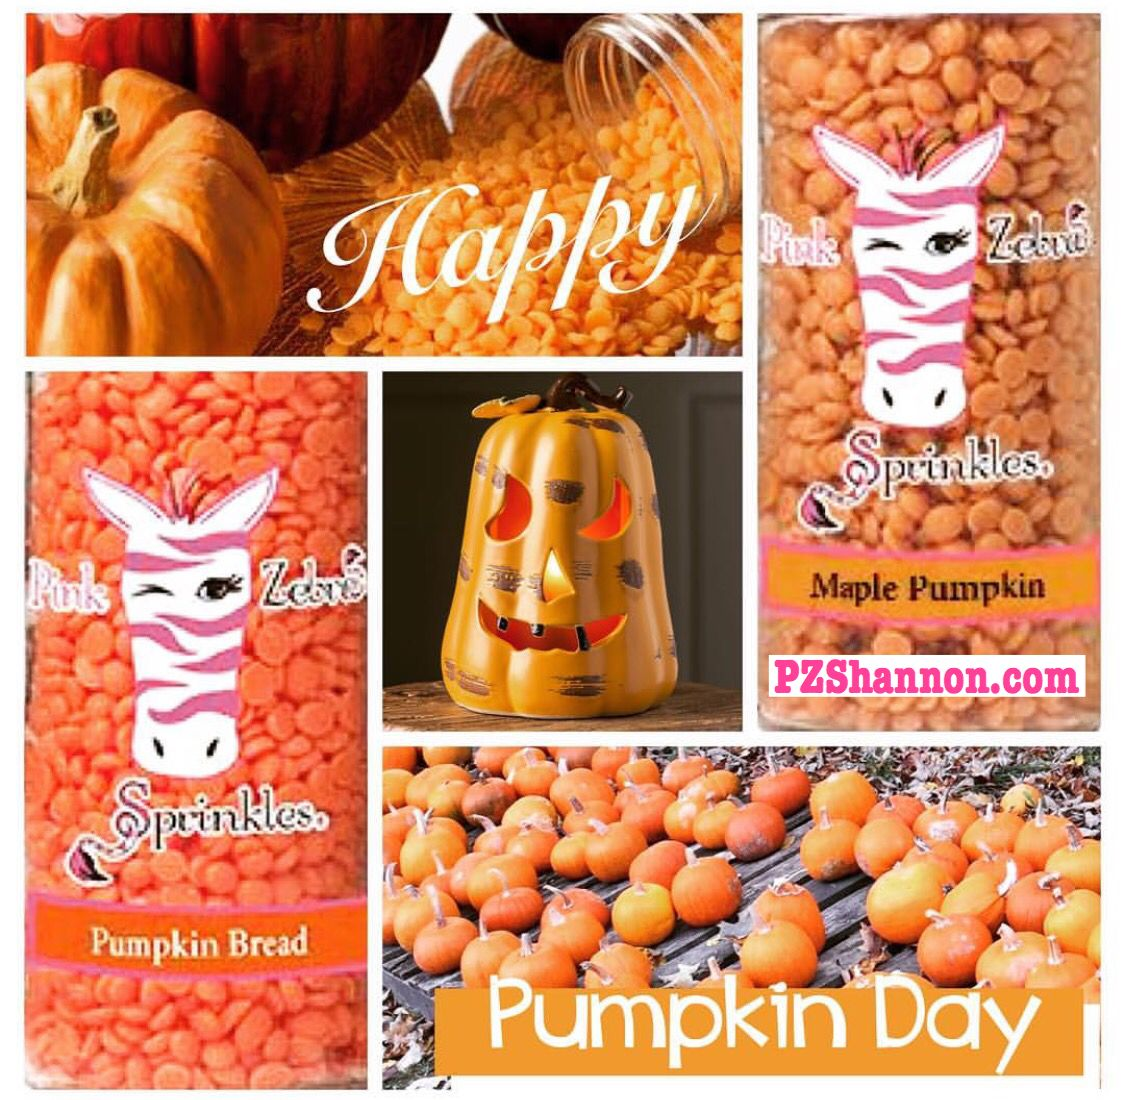 PZSHANNON.com  Happy Pumpkin Day-Pumpkin Bread, Pumpkin Amber, & Maple Pumpkin-